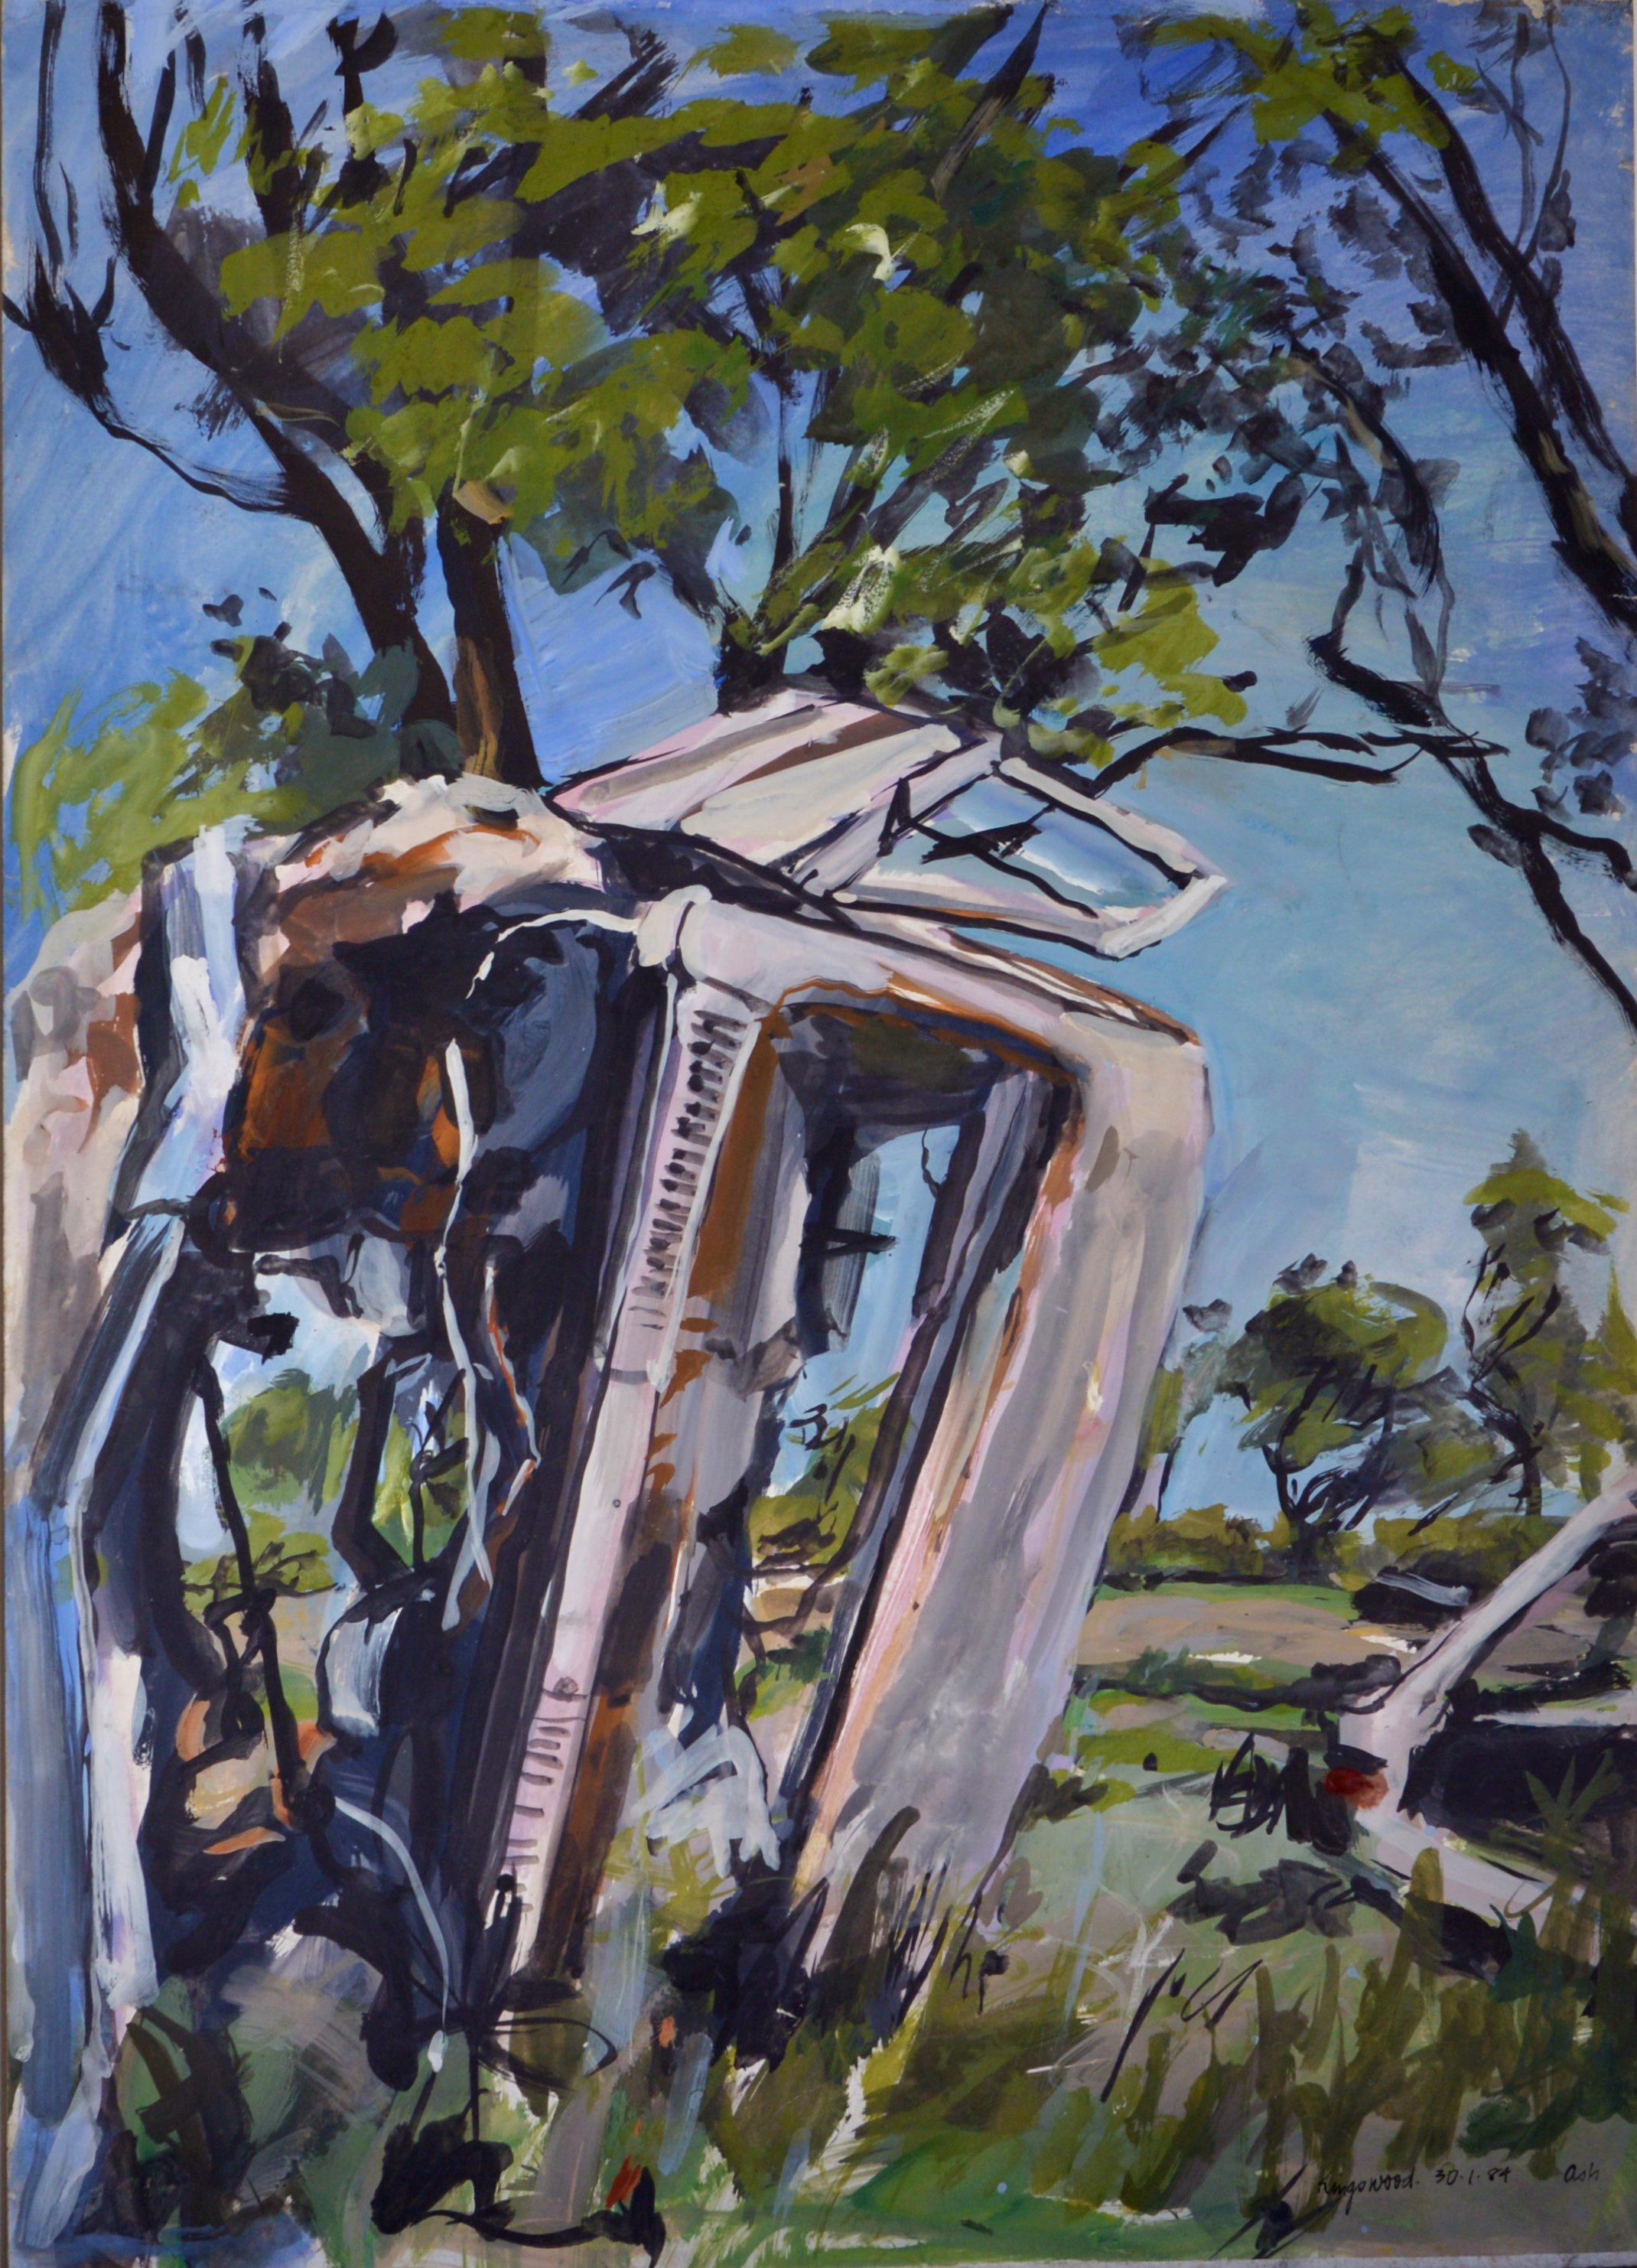 Wreckage (Kingswood) 1984 gouache on paper 85 x 61cm